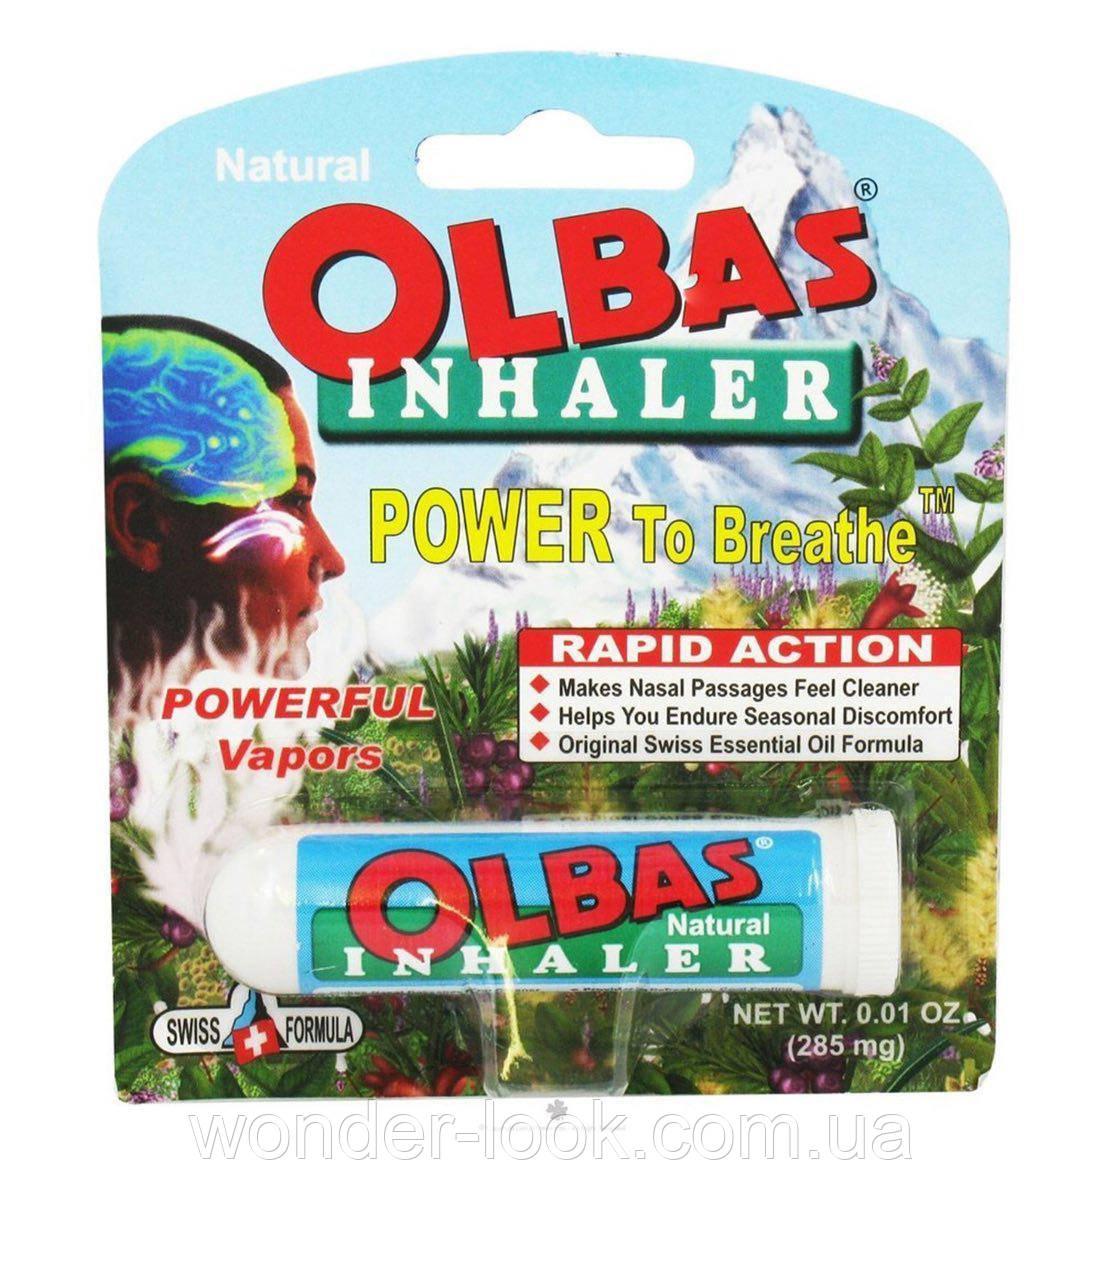 Olbas Therapeutic, Ингалятор, 0.01 унции (285 мг)